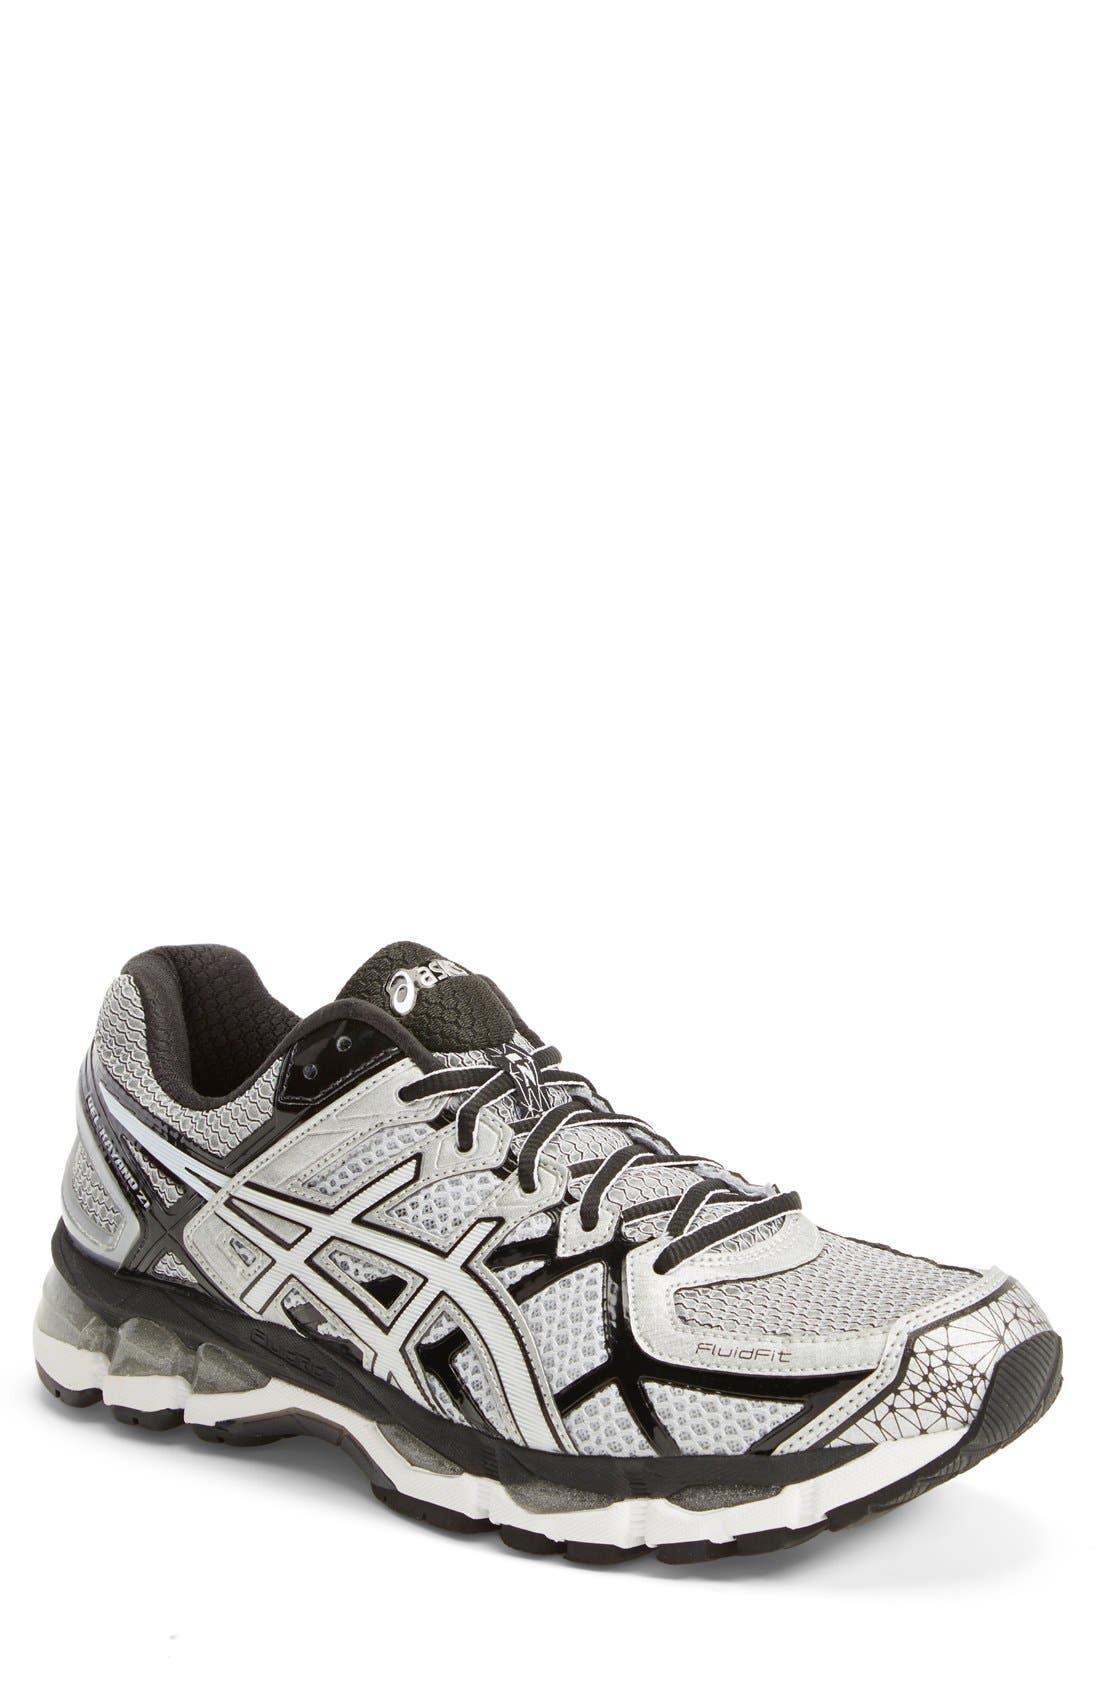 ASICS® Chaussure course de course GEL Kayano® GEL 21 (En (Homme) (En ligne seulement) | ce35e8f - www.meganking.website